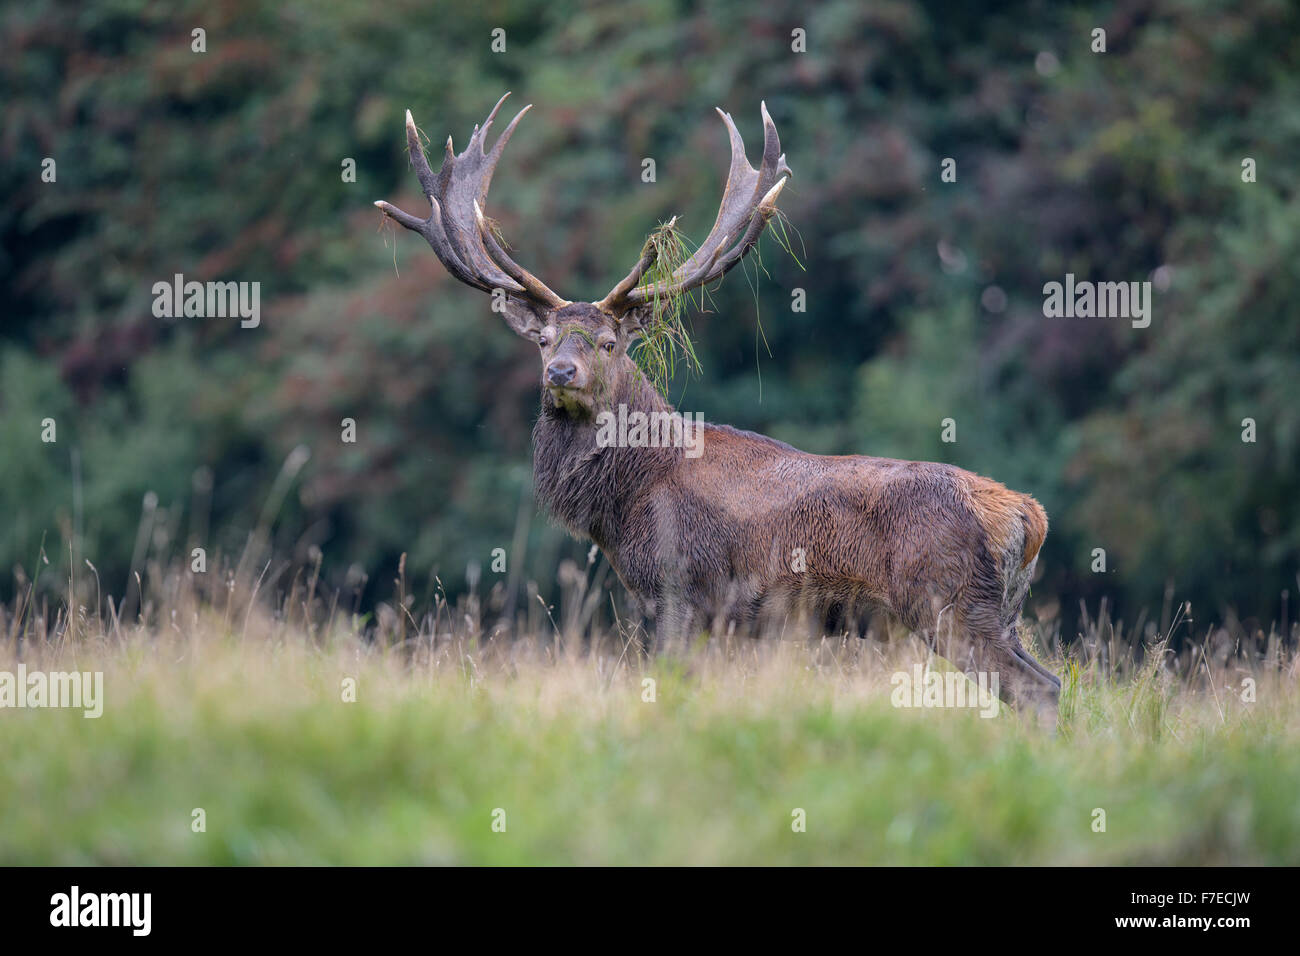 Red deer (Cervus elaphus), Royal Stag near forest, roaring, grass in antlers, Zealand, Denmark - Stock Image